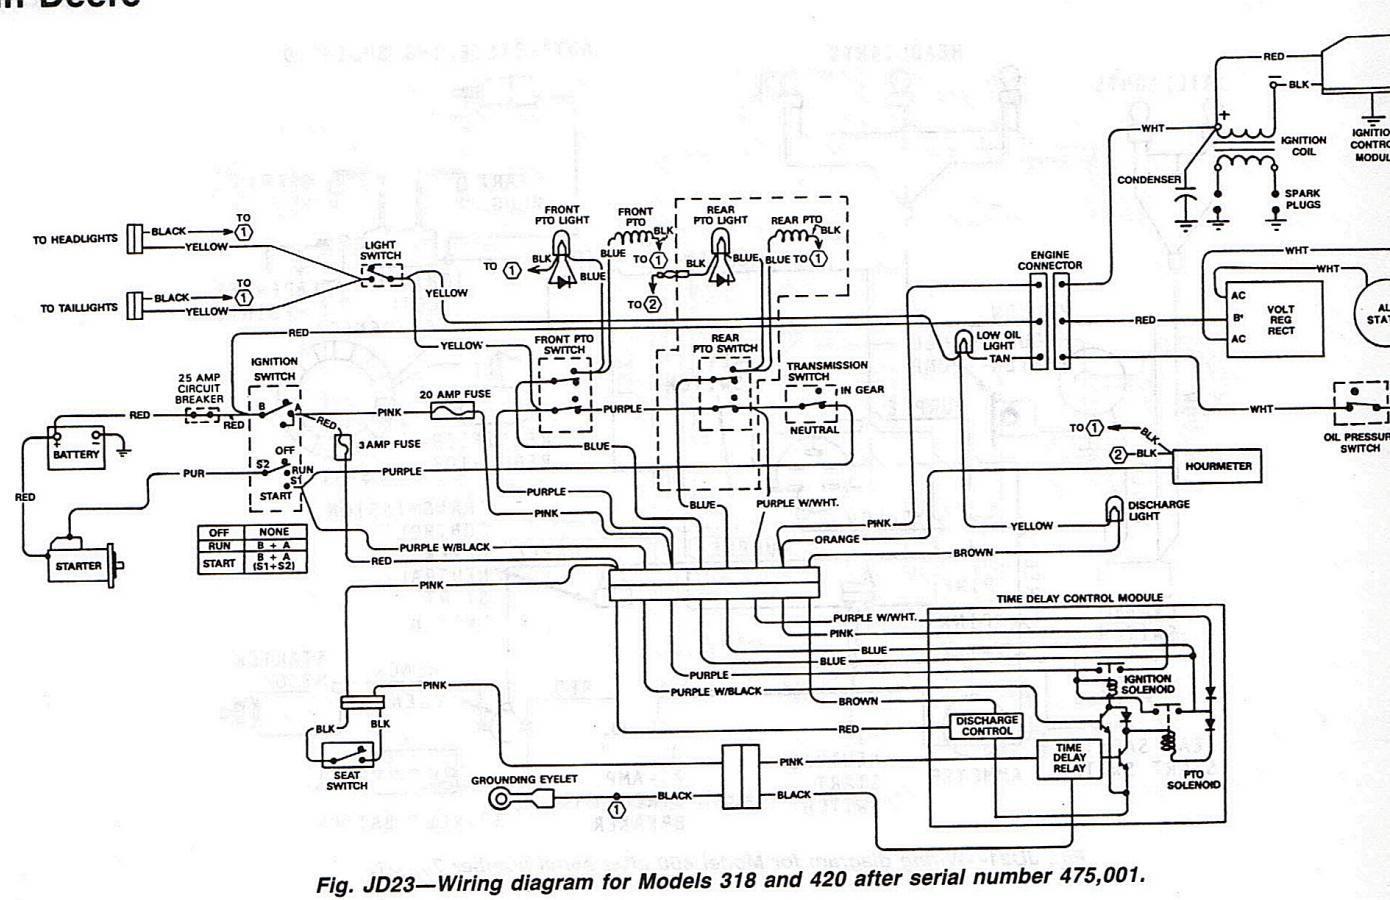 Nd 2800 Wiring Diagram John Deere F525 Also John Deere F525